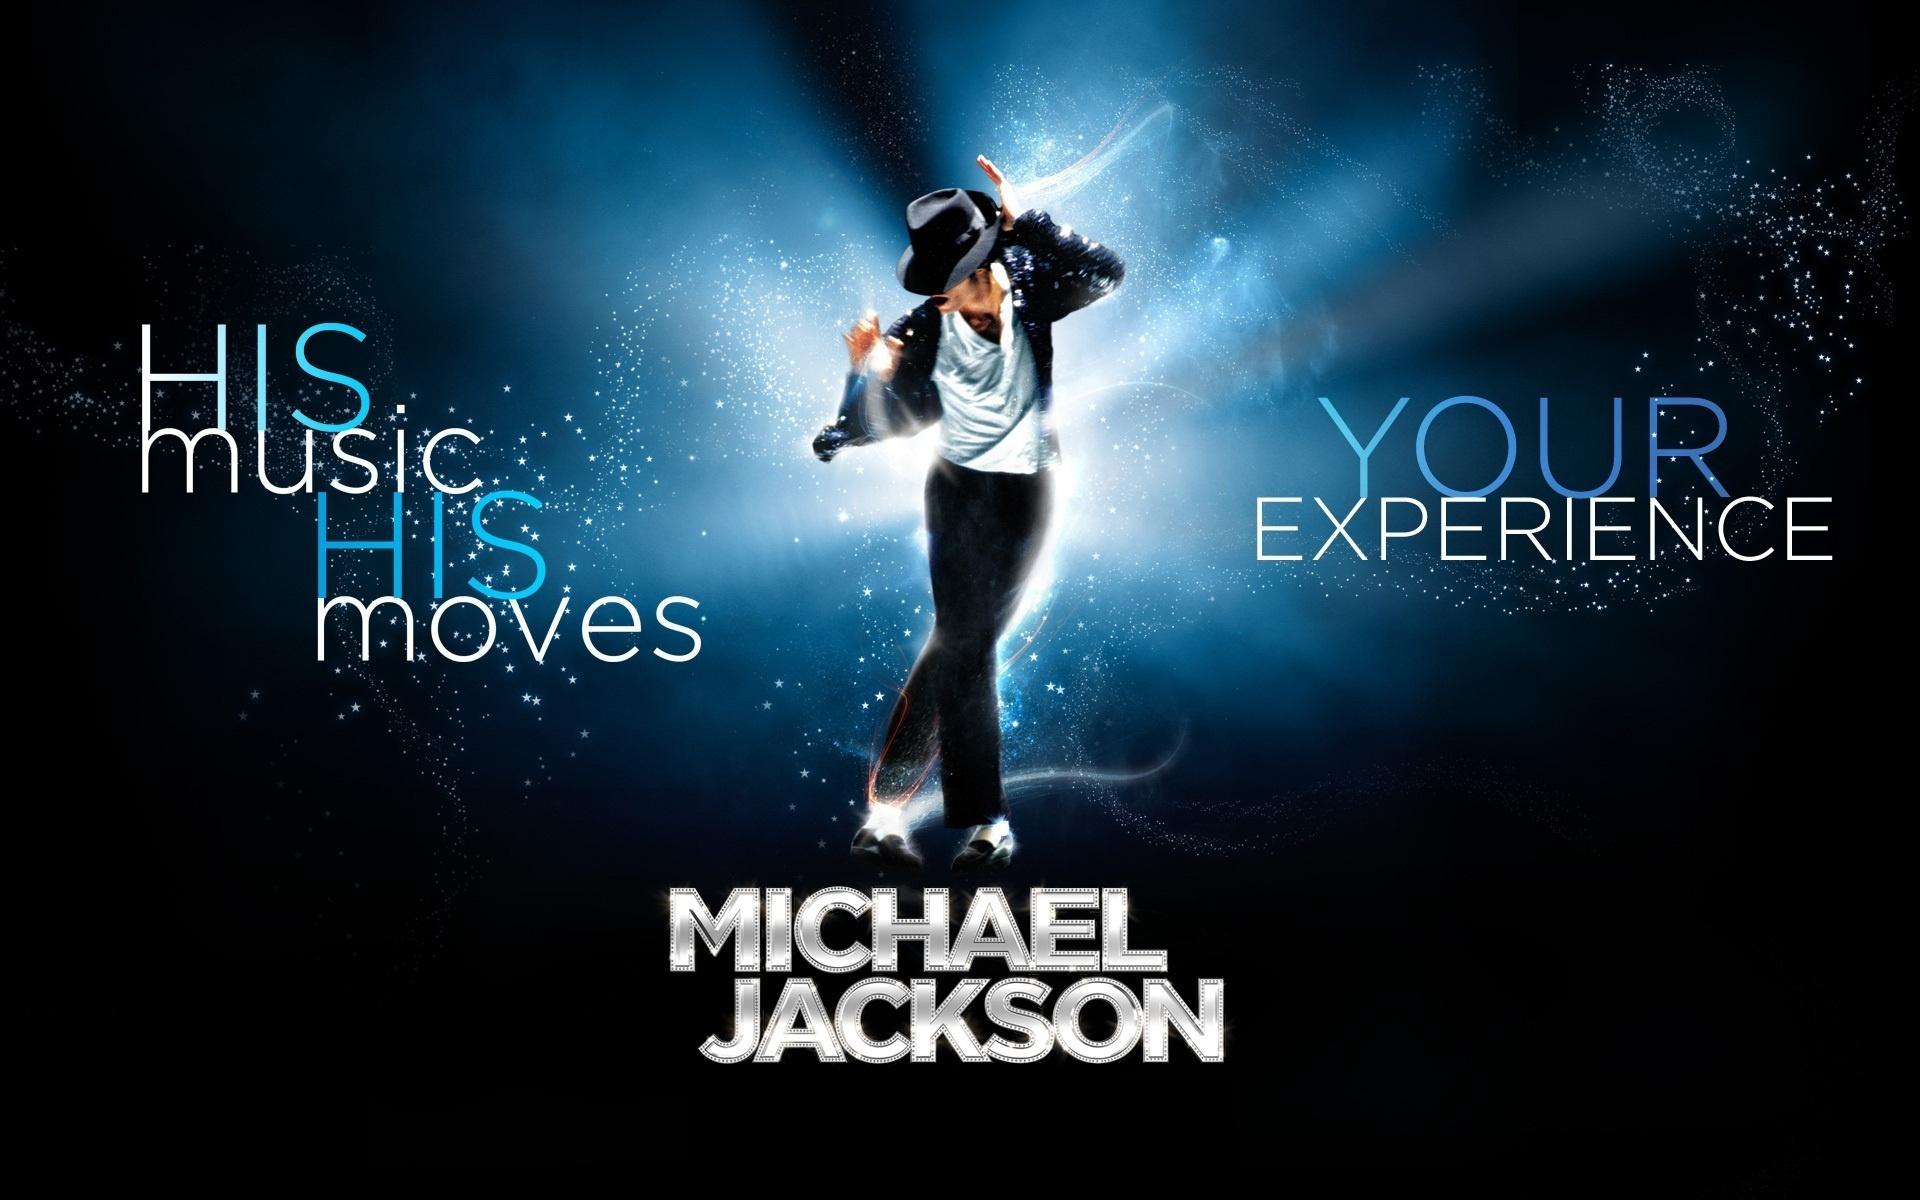 Michael jackson, мужчина, mj певец, звезда, майкл джексон